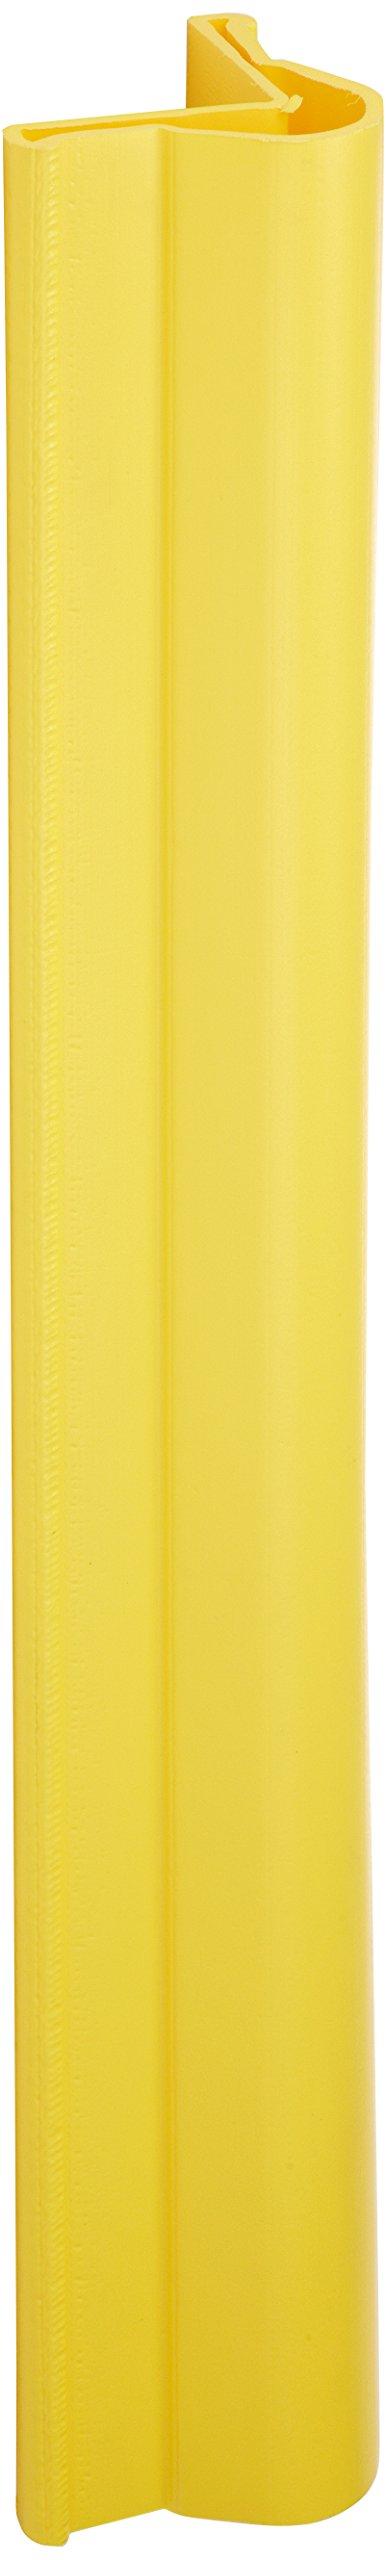 UltraTech 1523 Polyethylene Ultra-Corner Protector, 5-3/4'' Length x 5-5/8'' Width x 42'' Height, Yellow